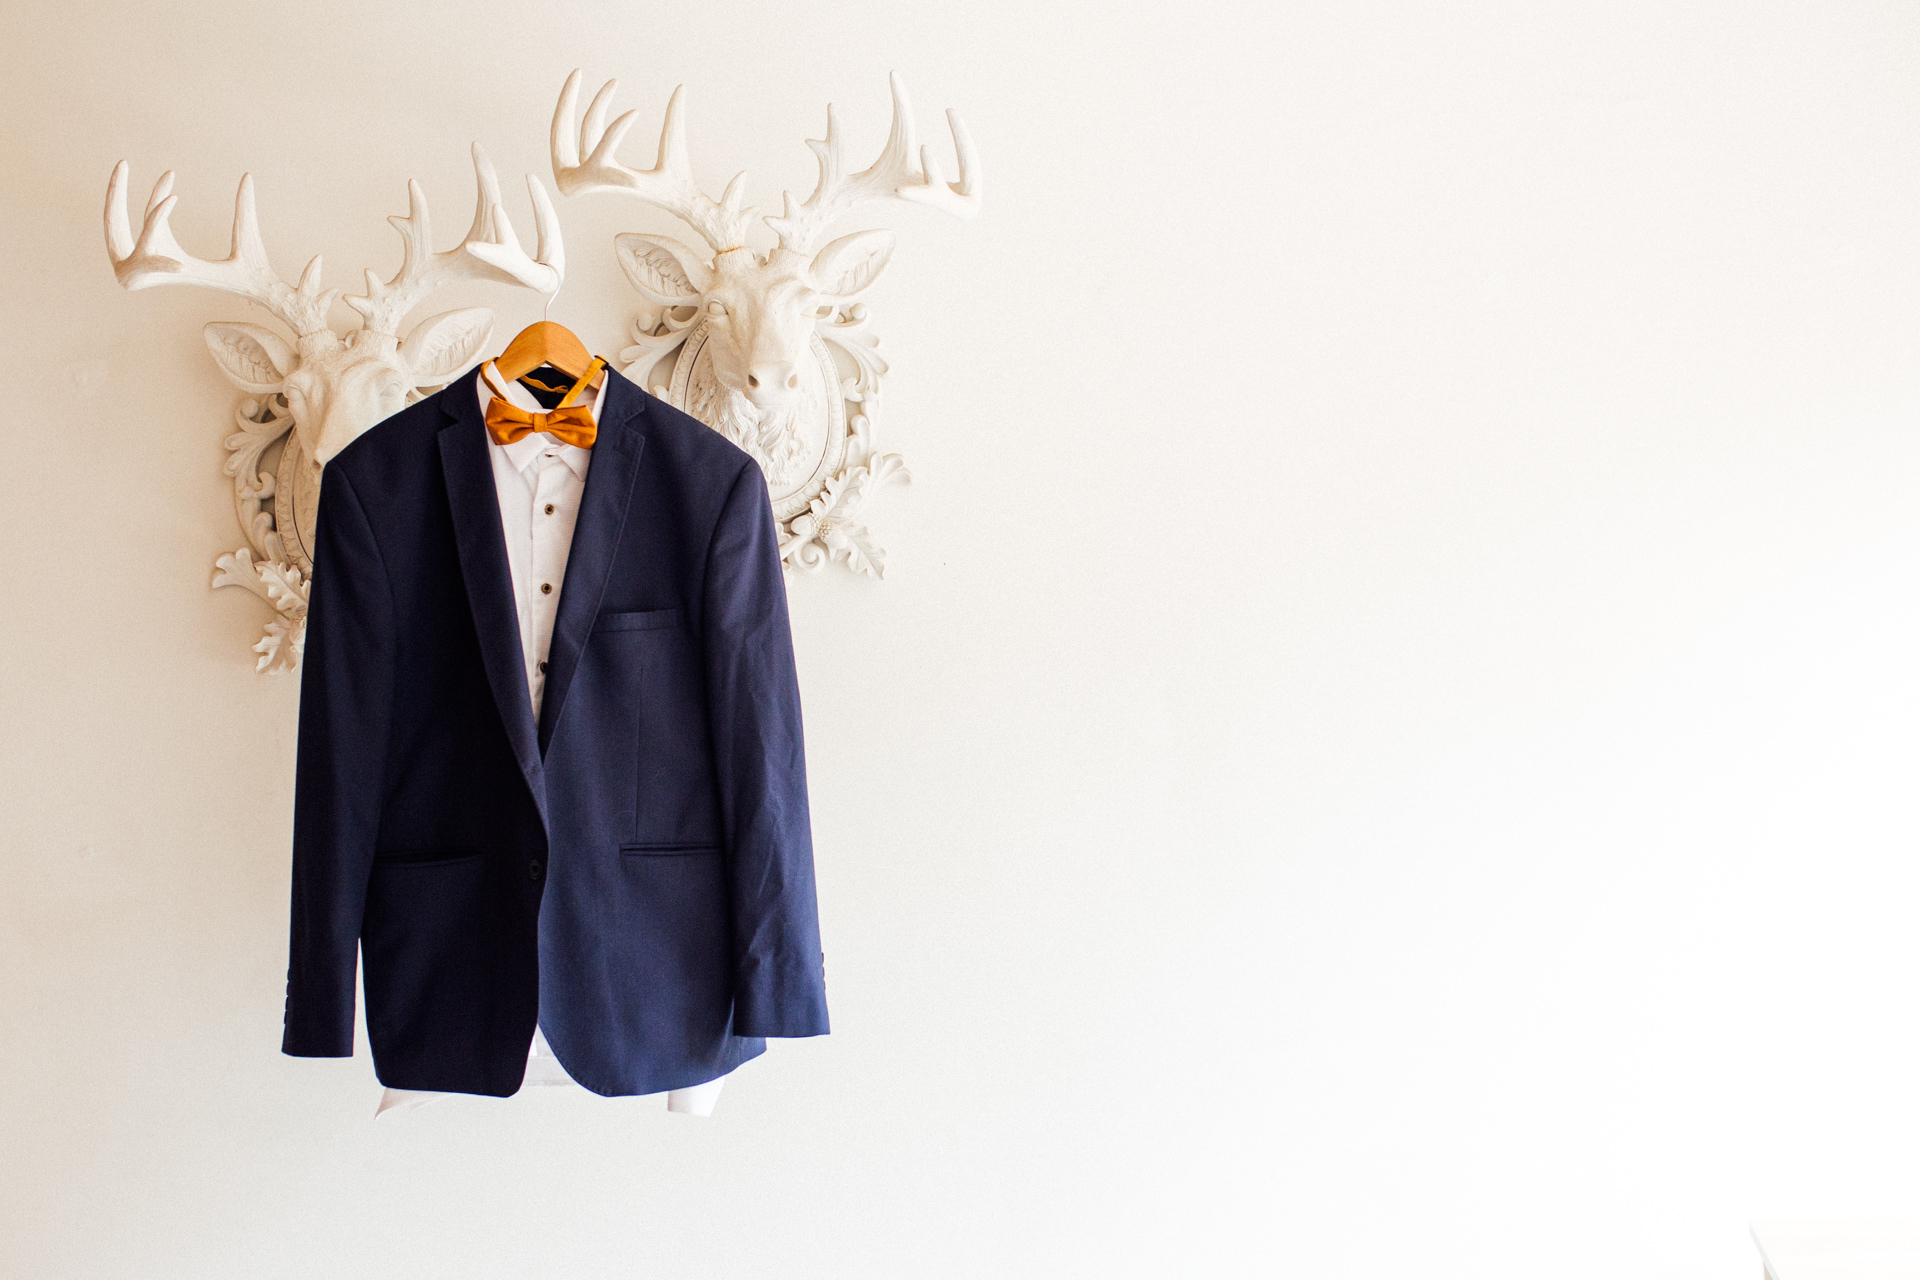 Wedding-Boda-Matrimonio-Fotografo-Fotografia-bodas-Medellin-Llanogrande-Colombia-Bogota-Cartagena-Miami-Wed-Destination-Photojournalism (236).JPG